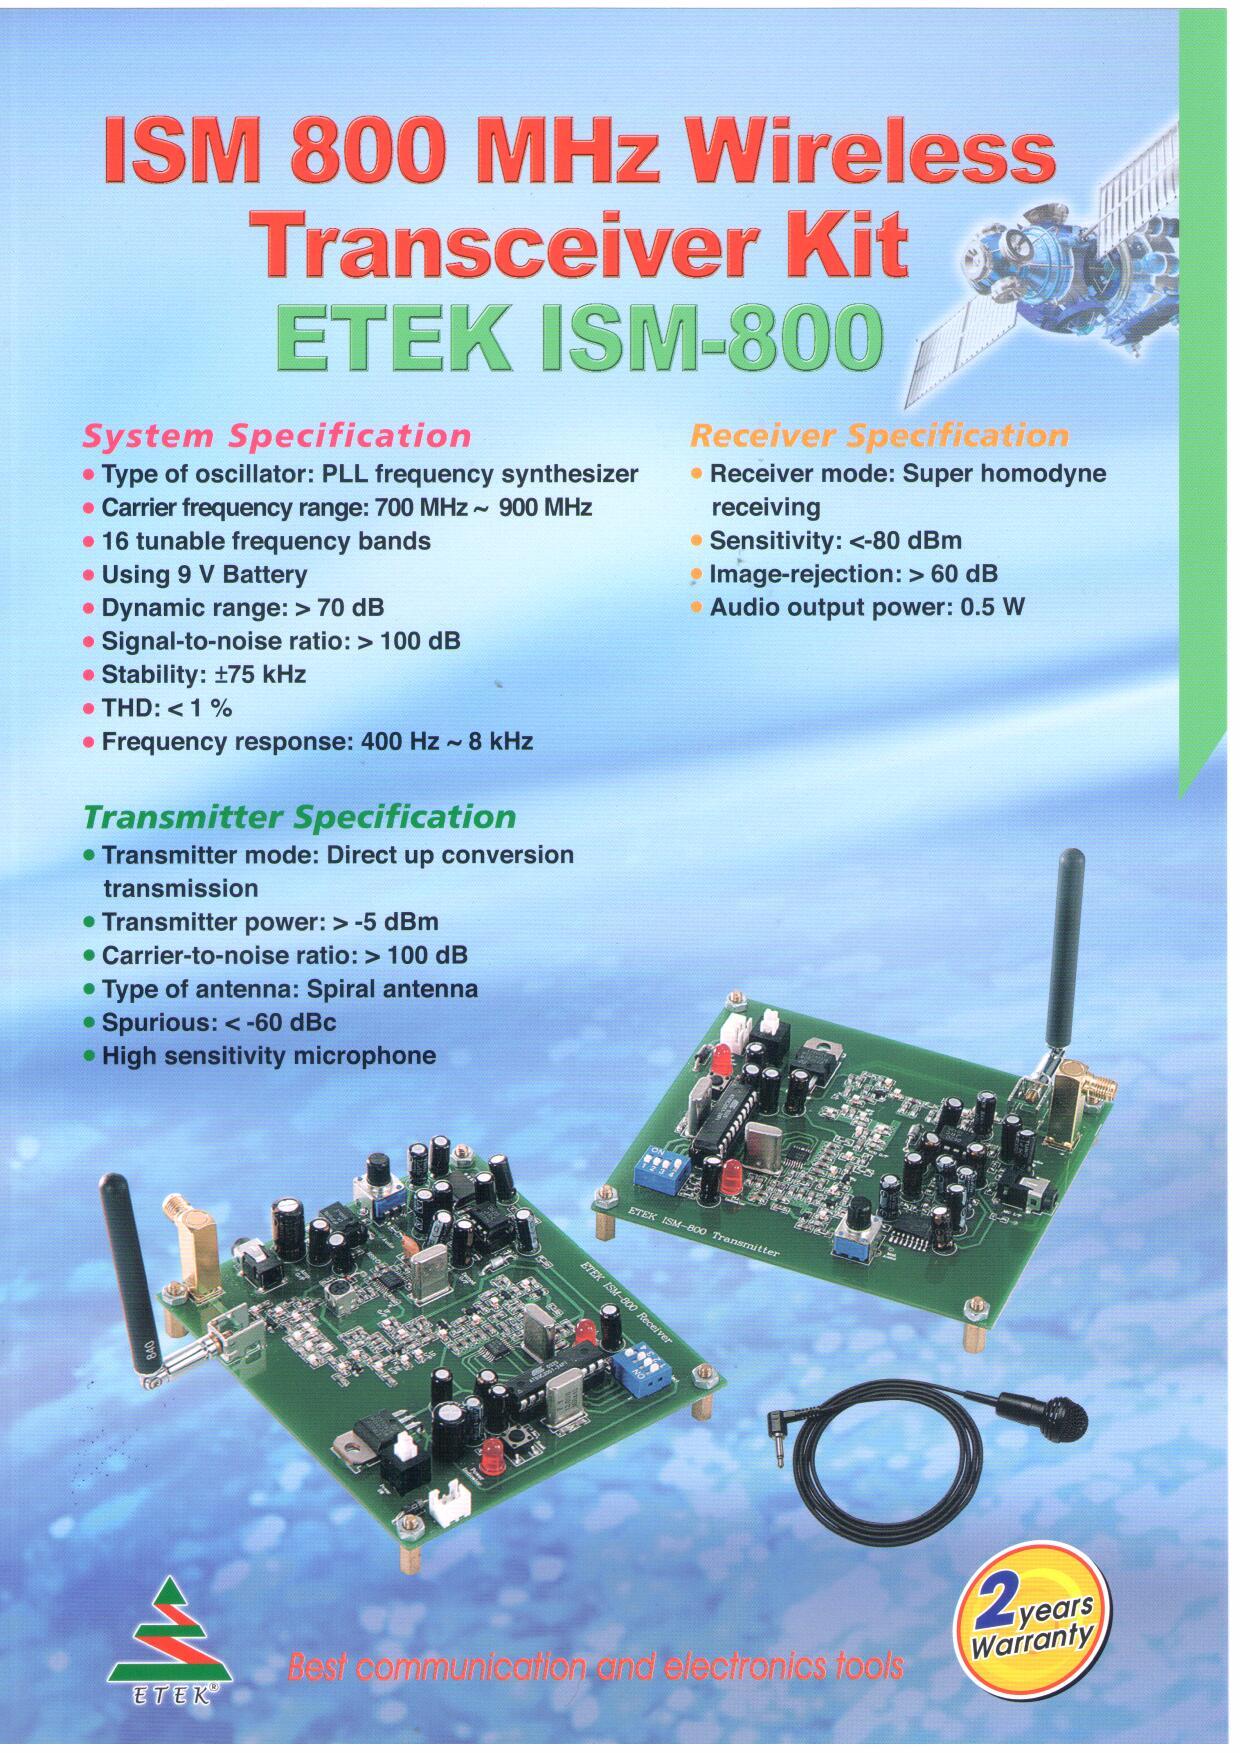 Etek Ism 800ism 800 Mhz Wireless Transceiver Kit Receiver Microphone Circuit